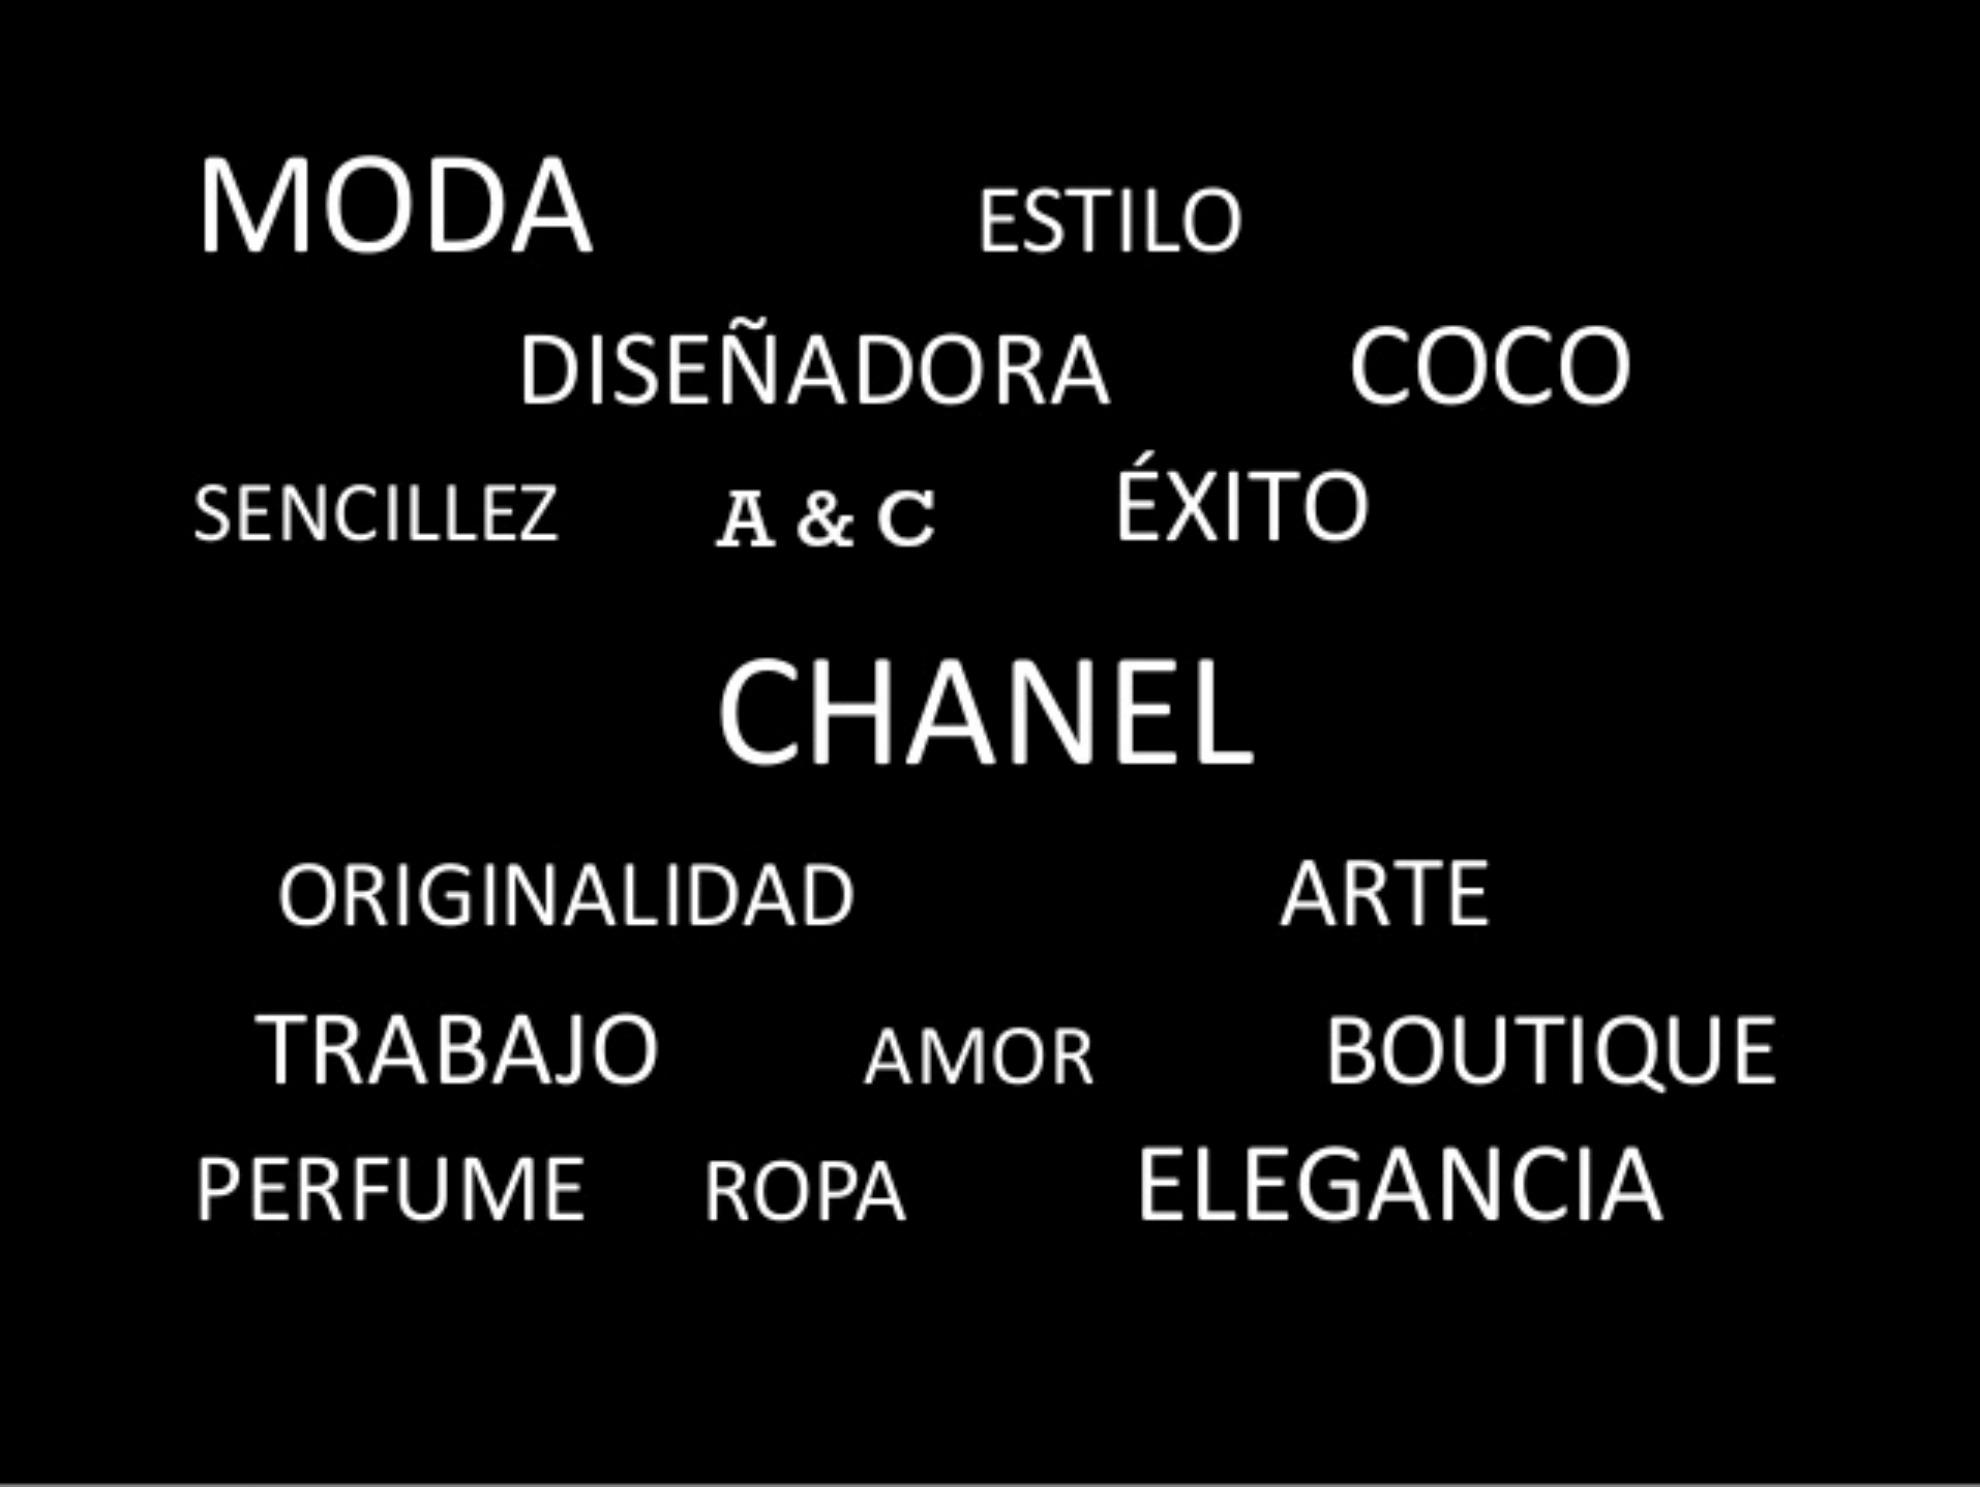 0coco-chanel-22-638